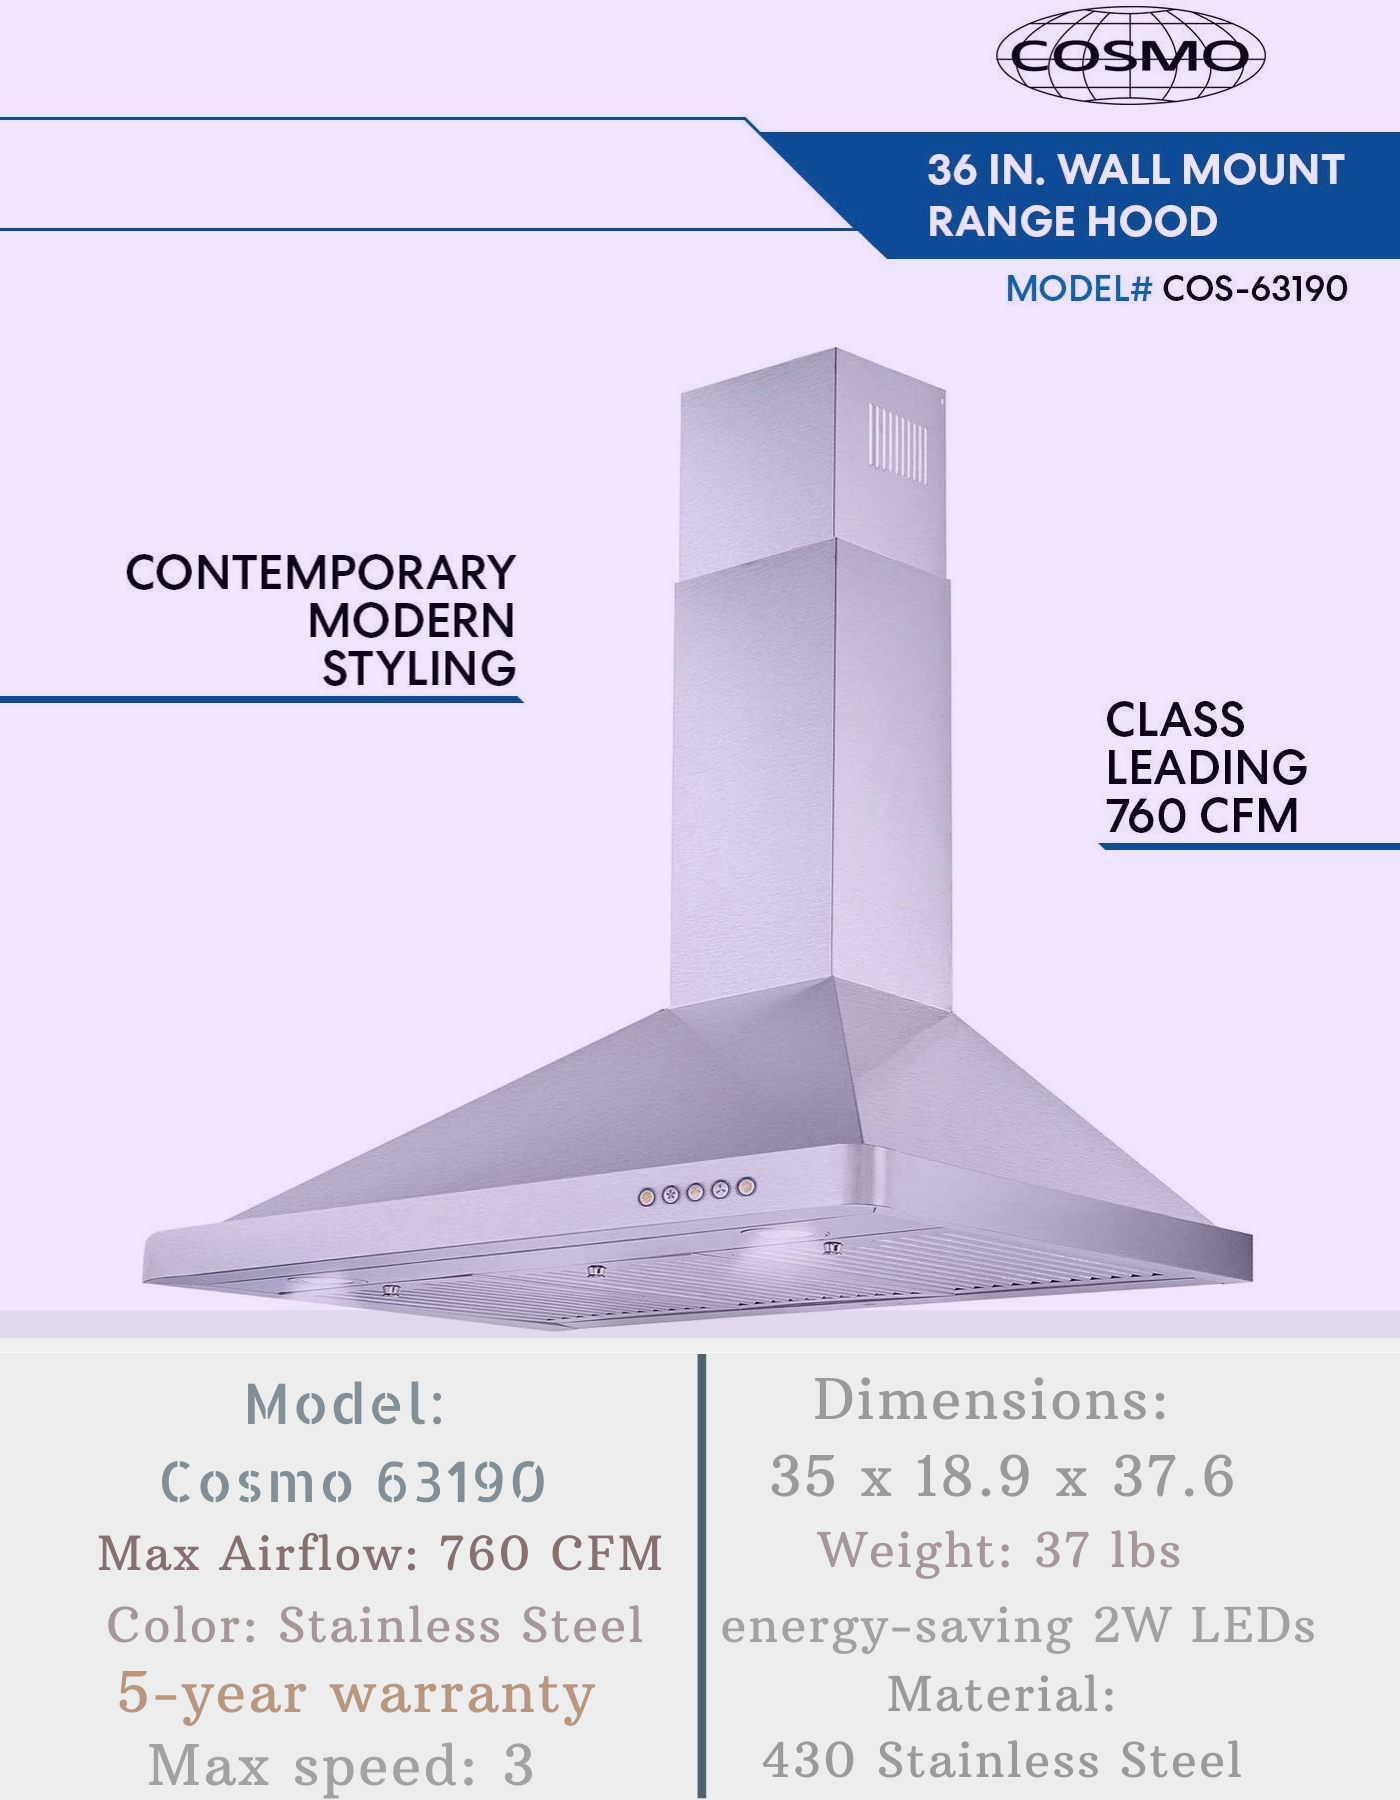 Best Cosmo Range Hood Reviews For 2020 Range Hood Reviews Range Hood Cosmos